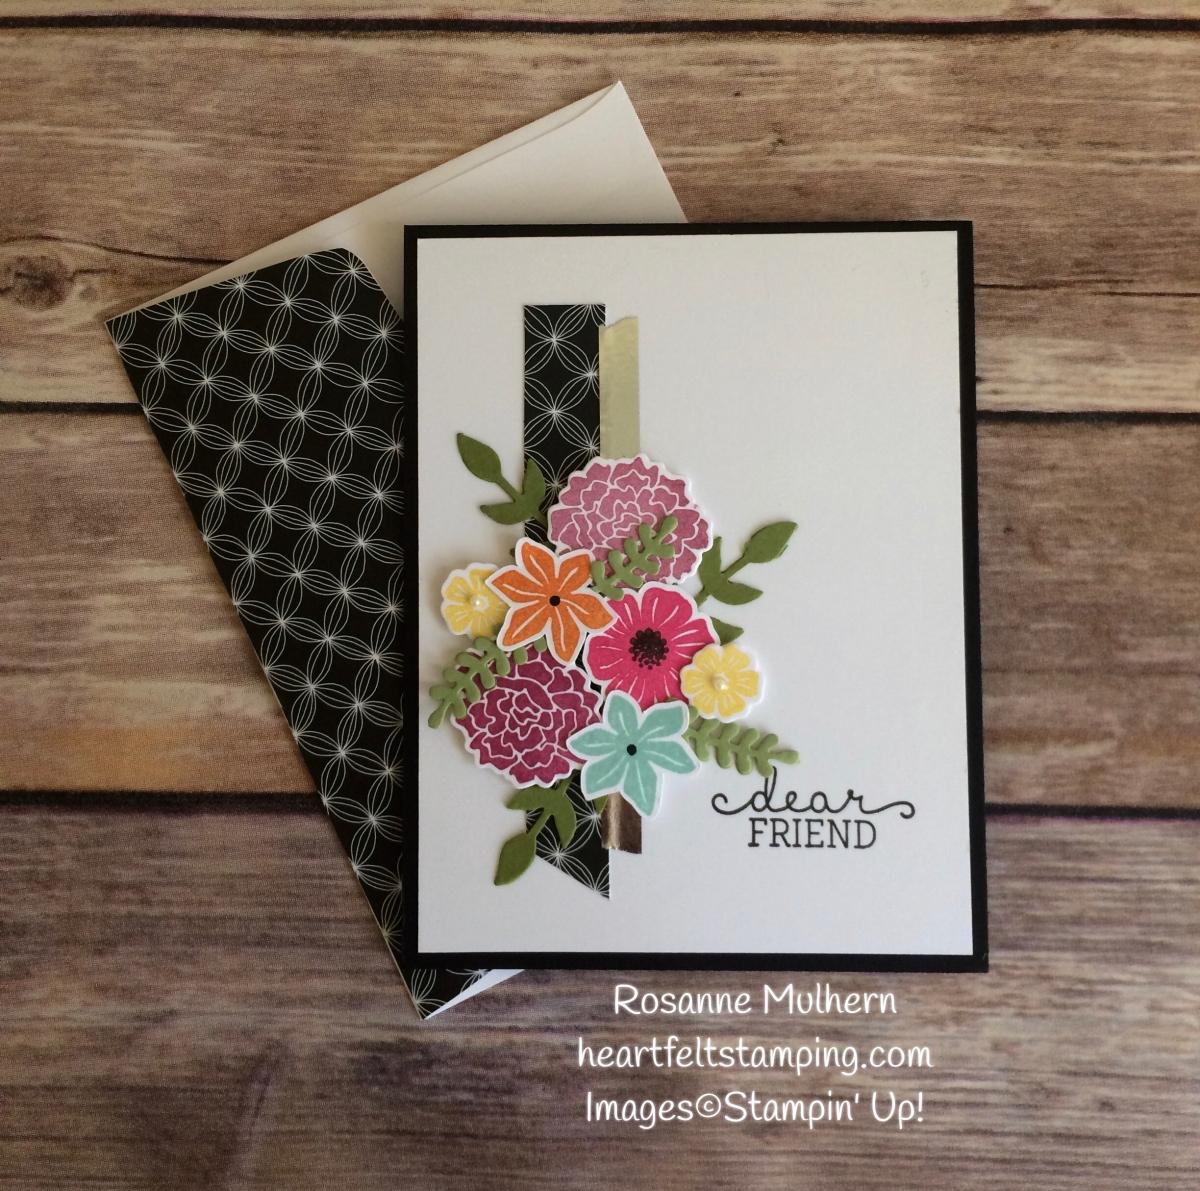 Stampin Up Beautiful Bouquet Friendship Card Idea Rosanne Mulhern Heartfelt Stamping Heartfelt Stamping